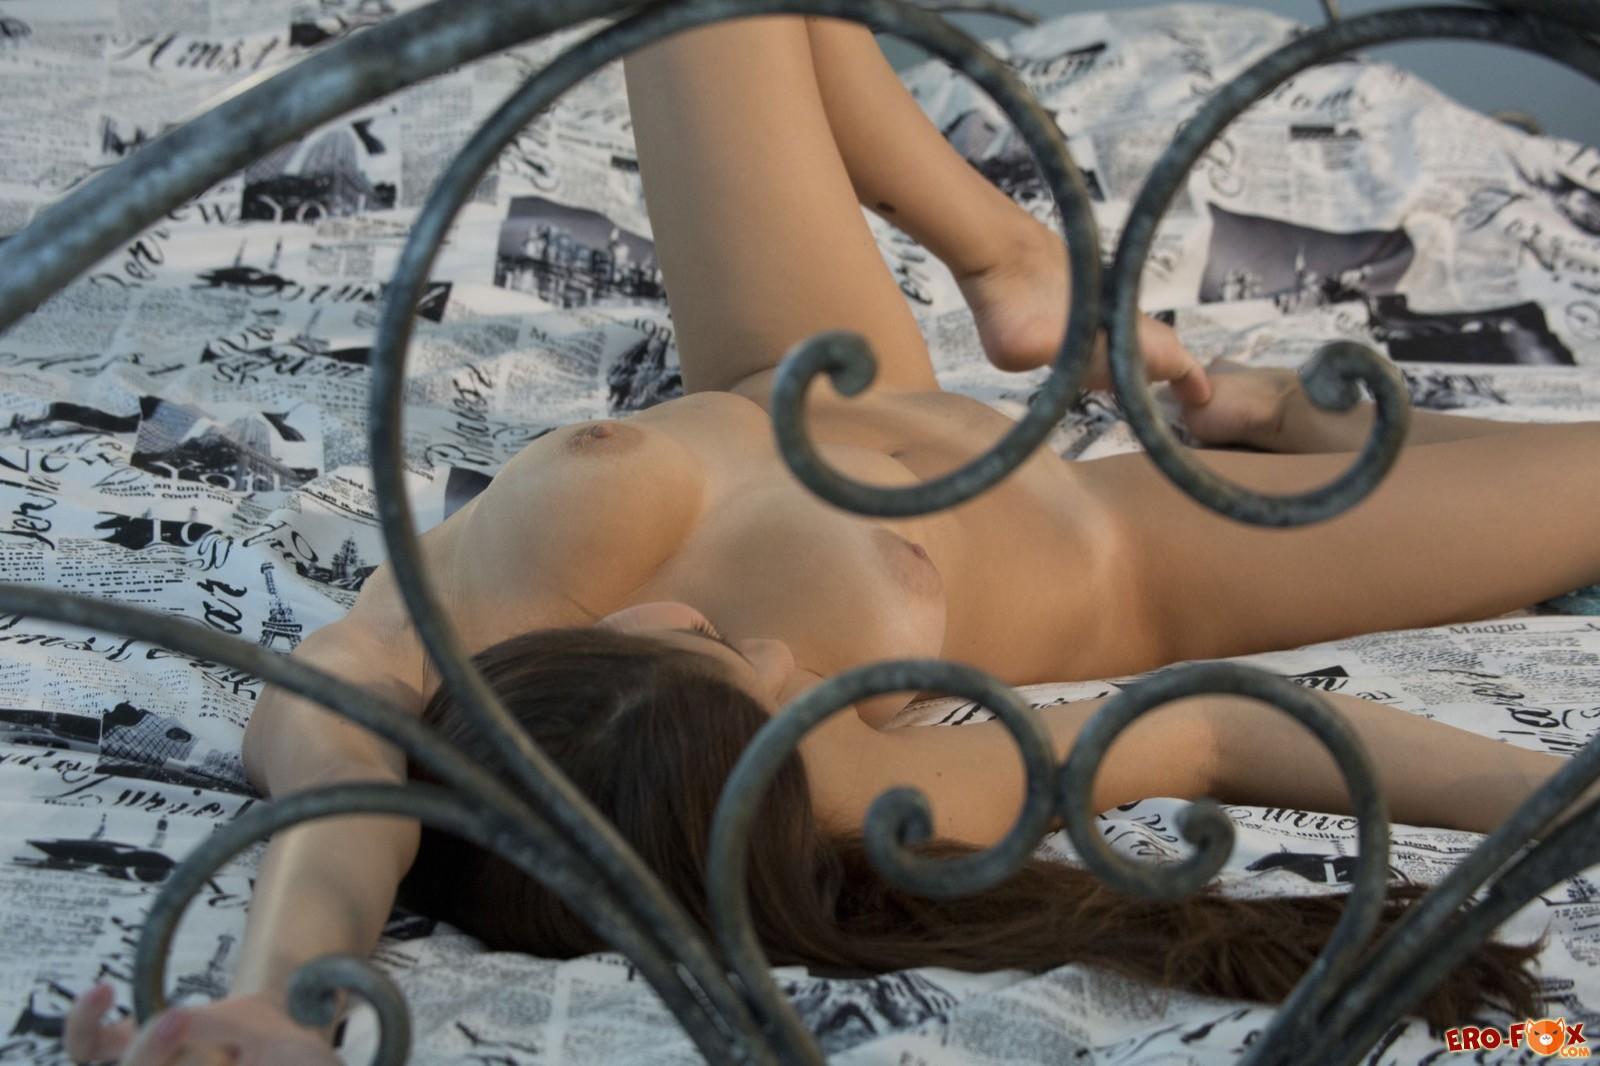 Девушка на кровати сняла нижнее бельё